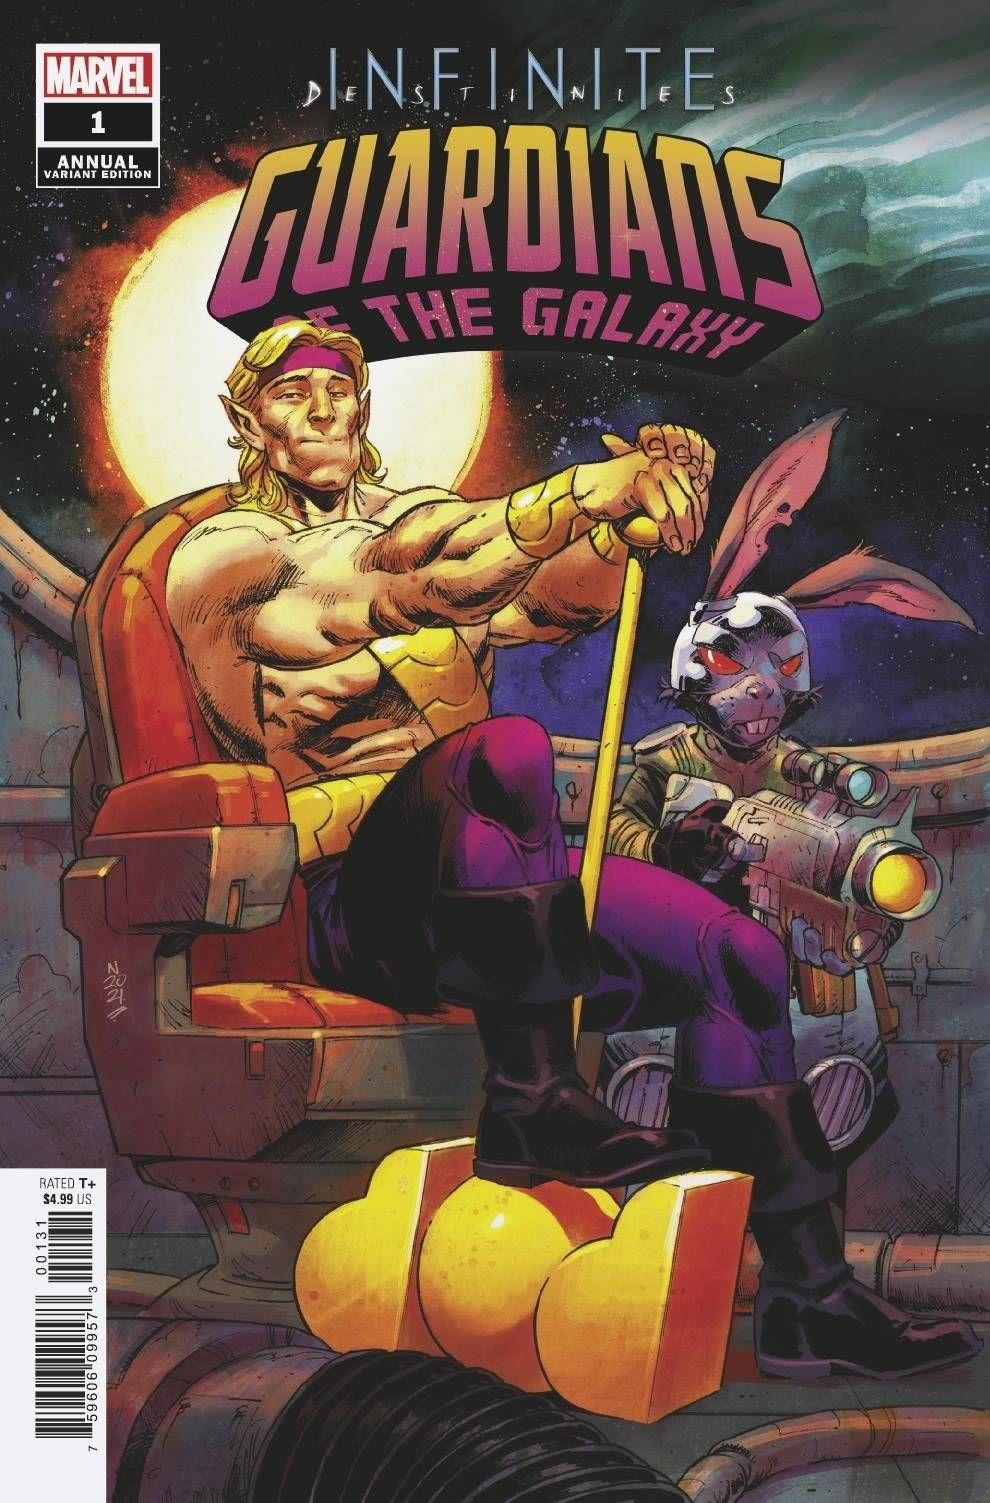 eyJidWNrZXQiOiJnb2NvbGxlY3QuaW1hZ2VzLnB1YiIsImtleSI6ImRjZTdiMDZmLWNhNmQtNDg4NS1hZThmLWU2NTRiZTgxNjE2My5qcGciLCJlZGl0cyI6W119 ComicList: Marvel Comics New Releases for 08/04/2021